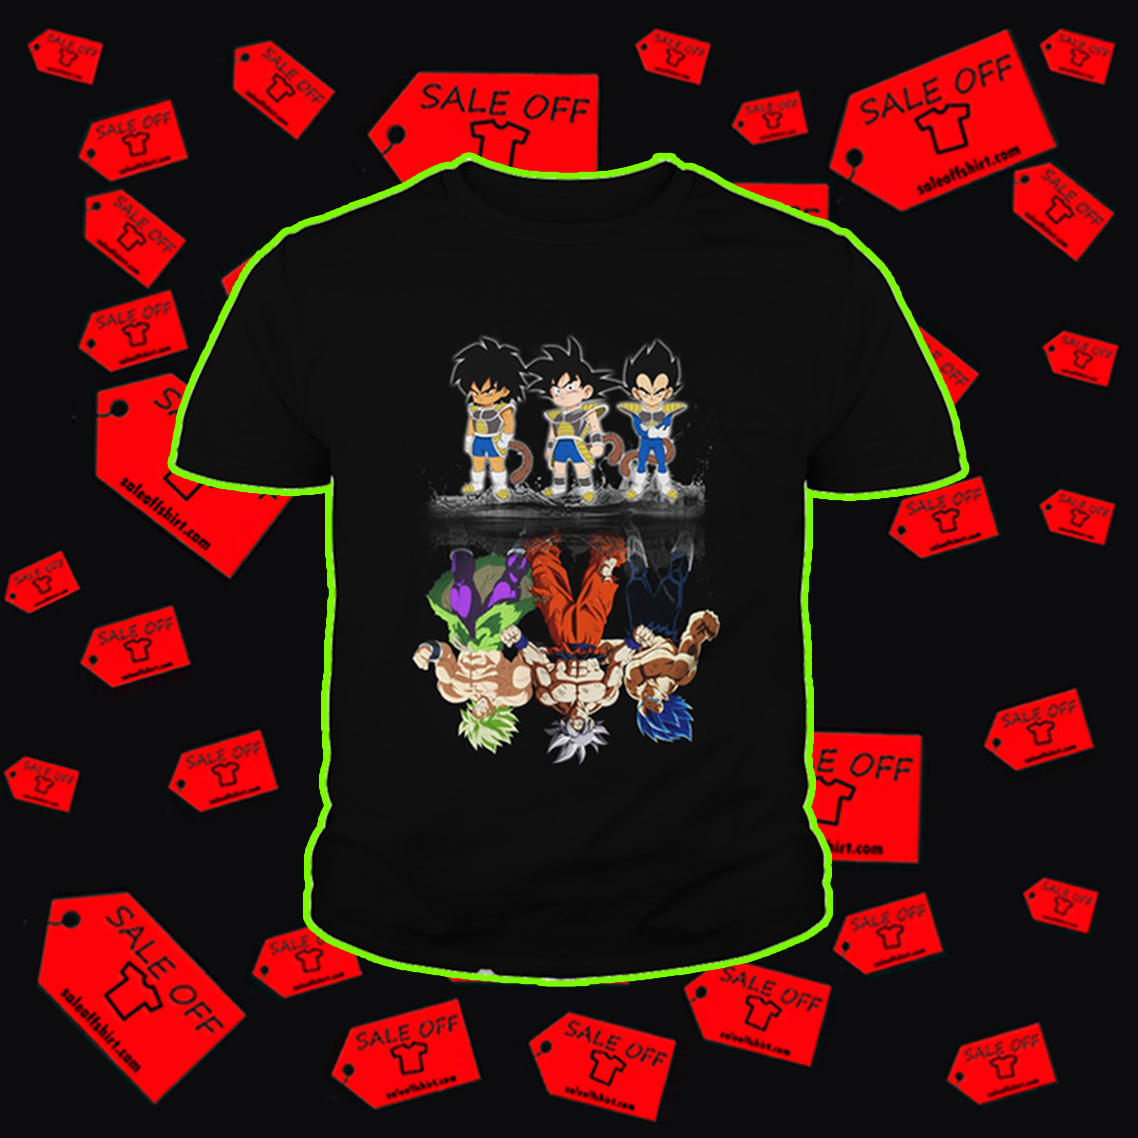 Super Saiyan Dragon Ball reflection youth tee